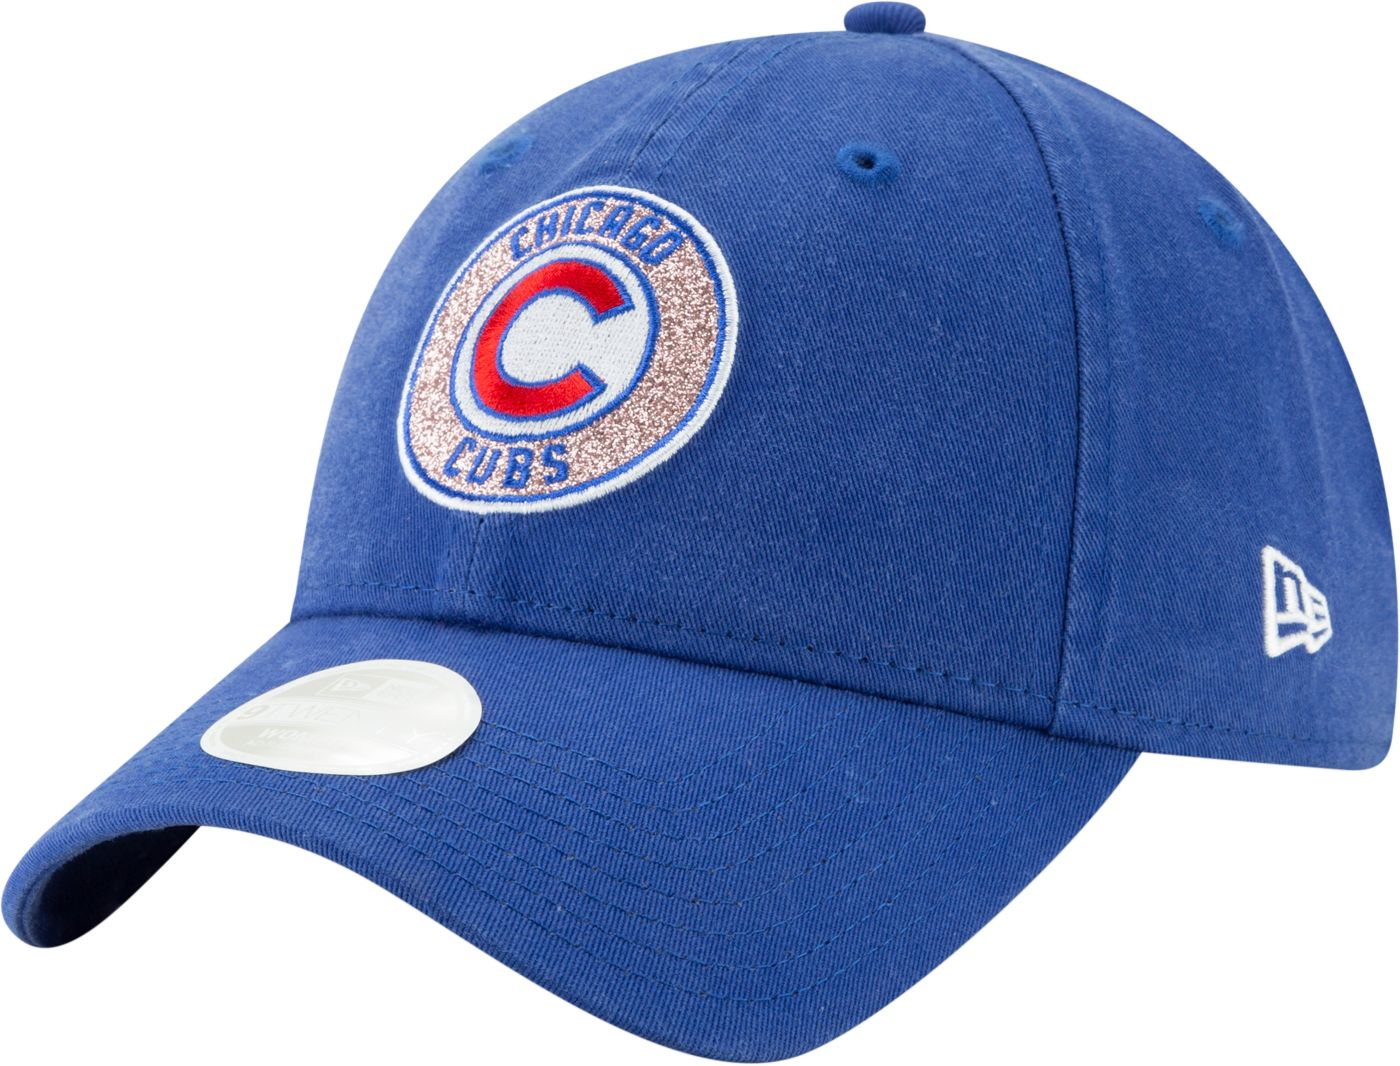 New Era Women's Chicago Cubs 9Twenty Patched Sparkle Adjustable Hat